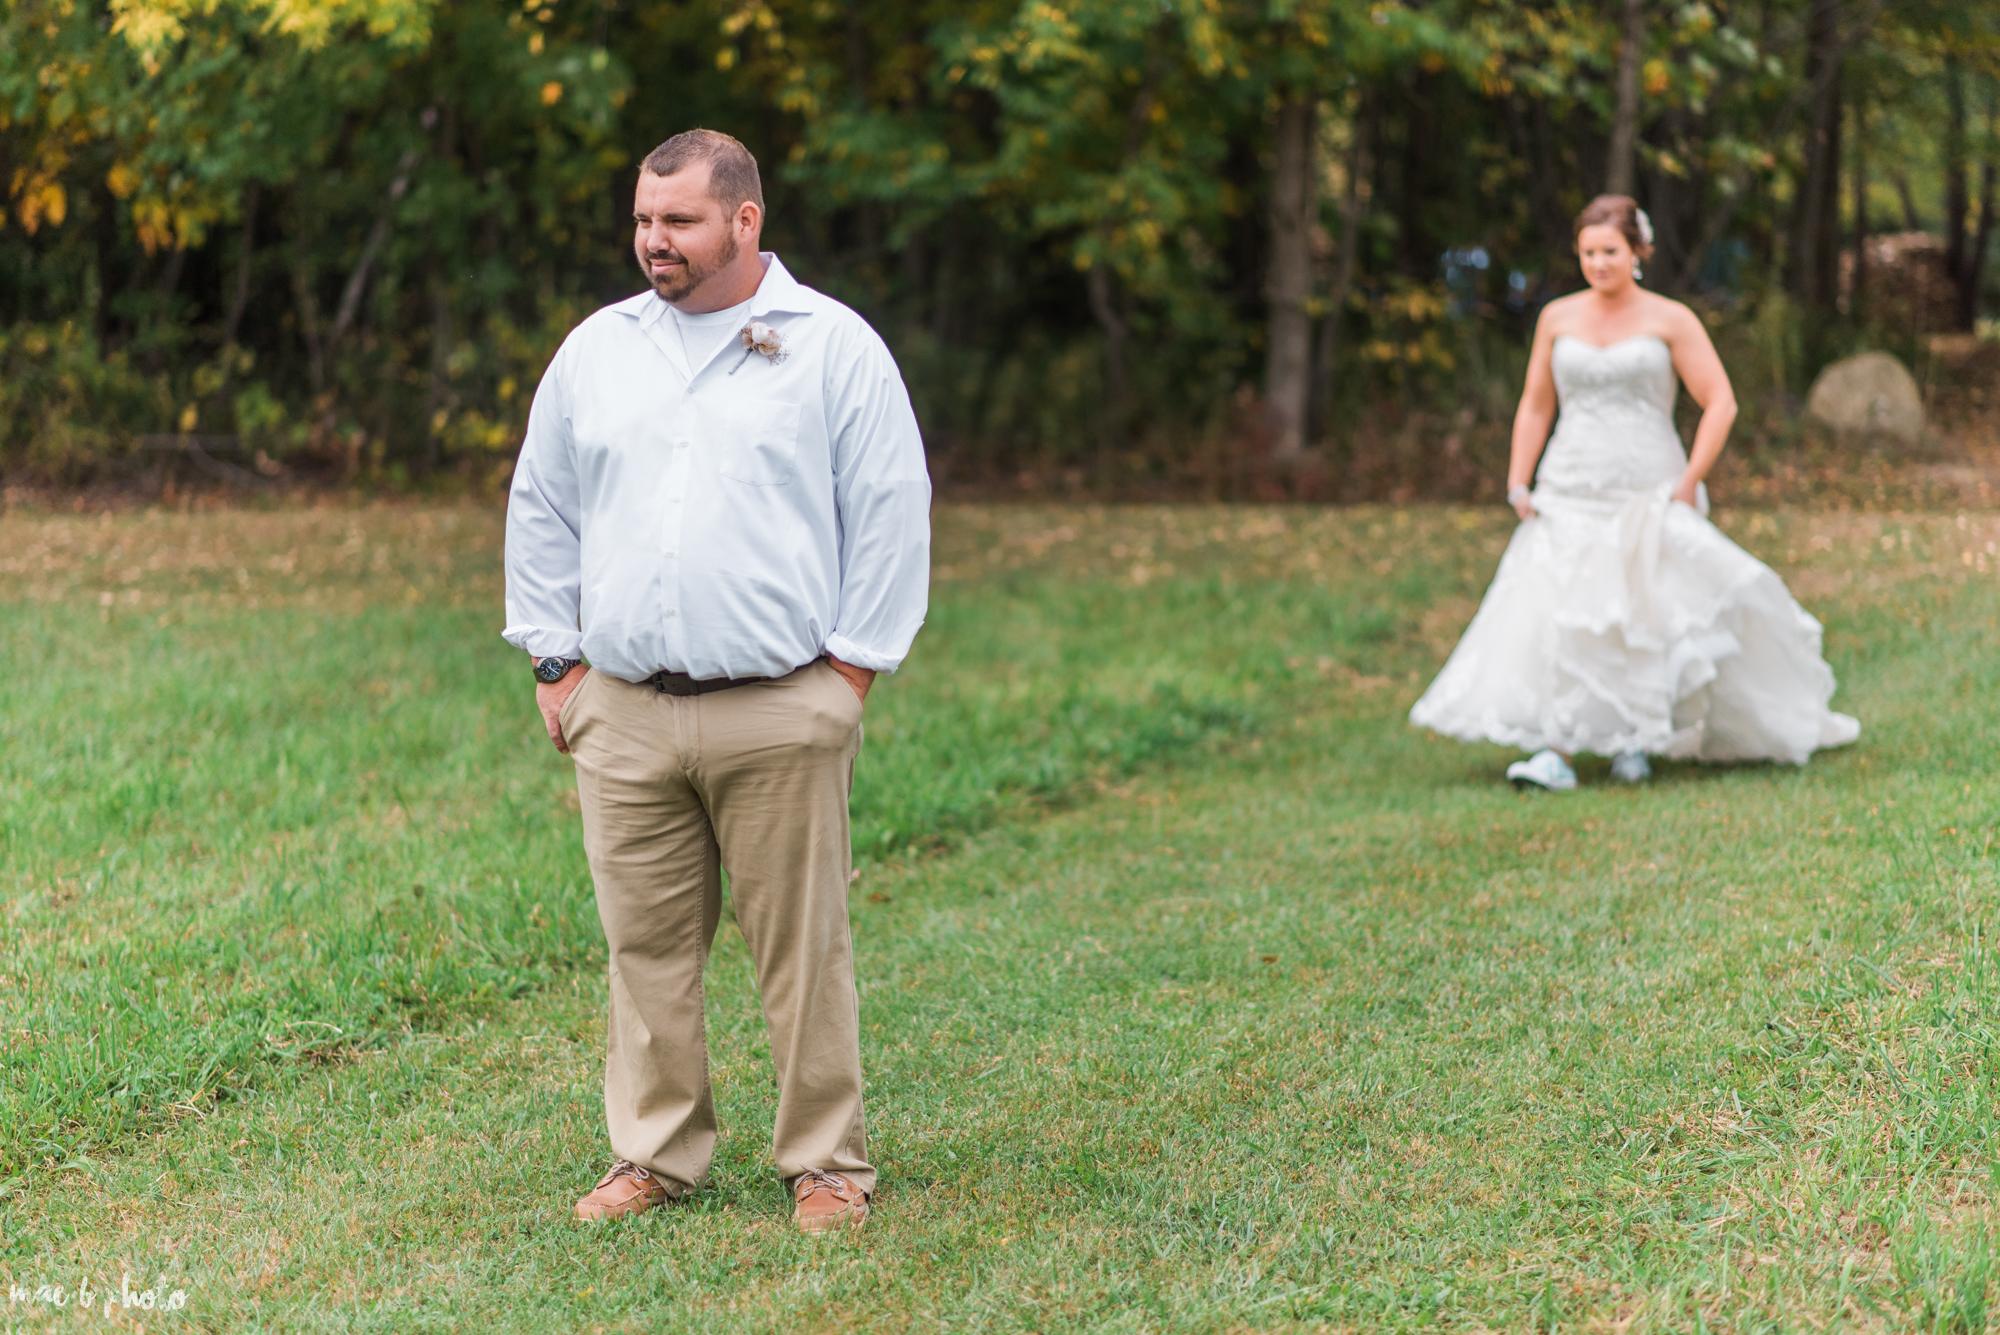 Sarah & Dustin's Rustic Chic Barn Wedding at Hartford Hill Winery in Hartford, Ohio by Mae B Photo-58.jpg